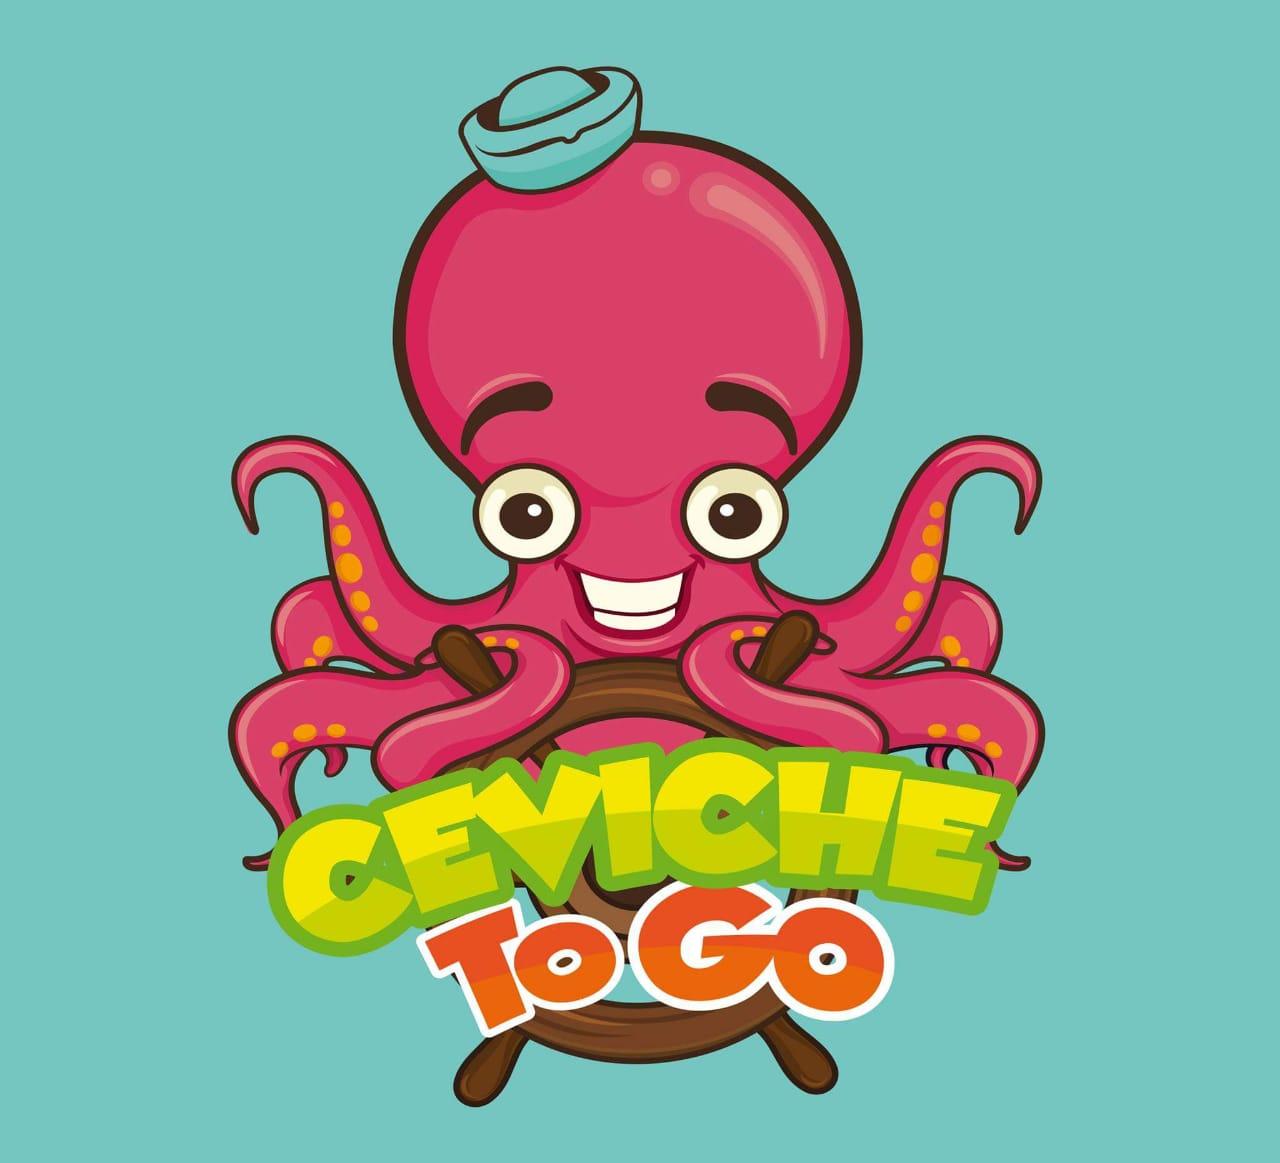 Ceviche to Go